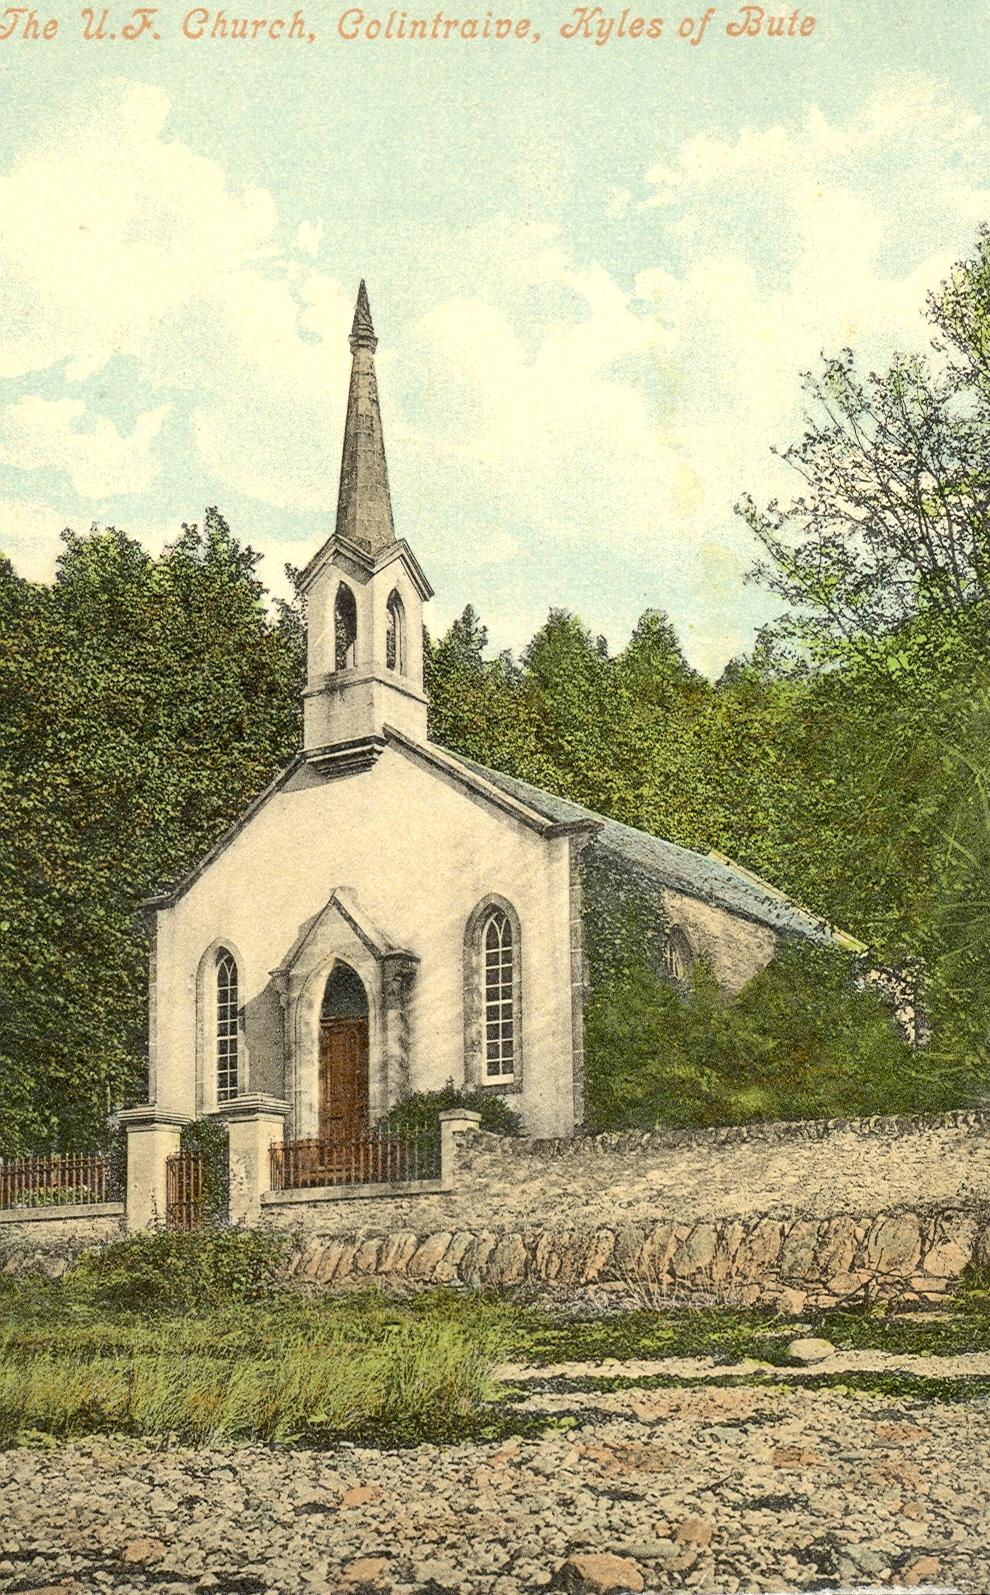 Colintraive Church